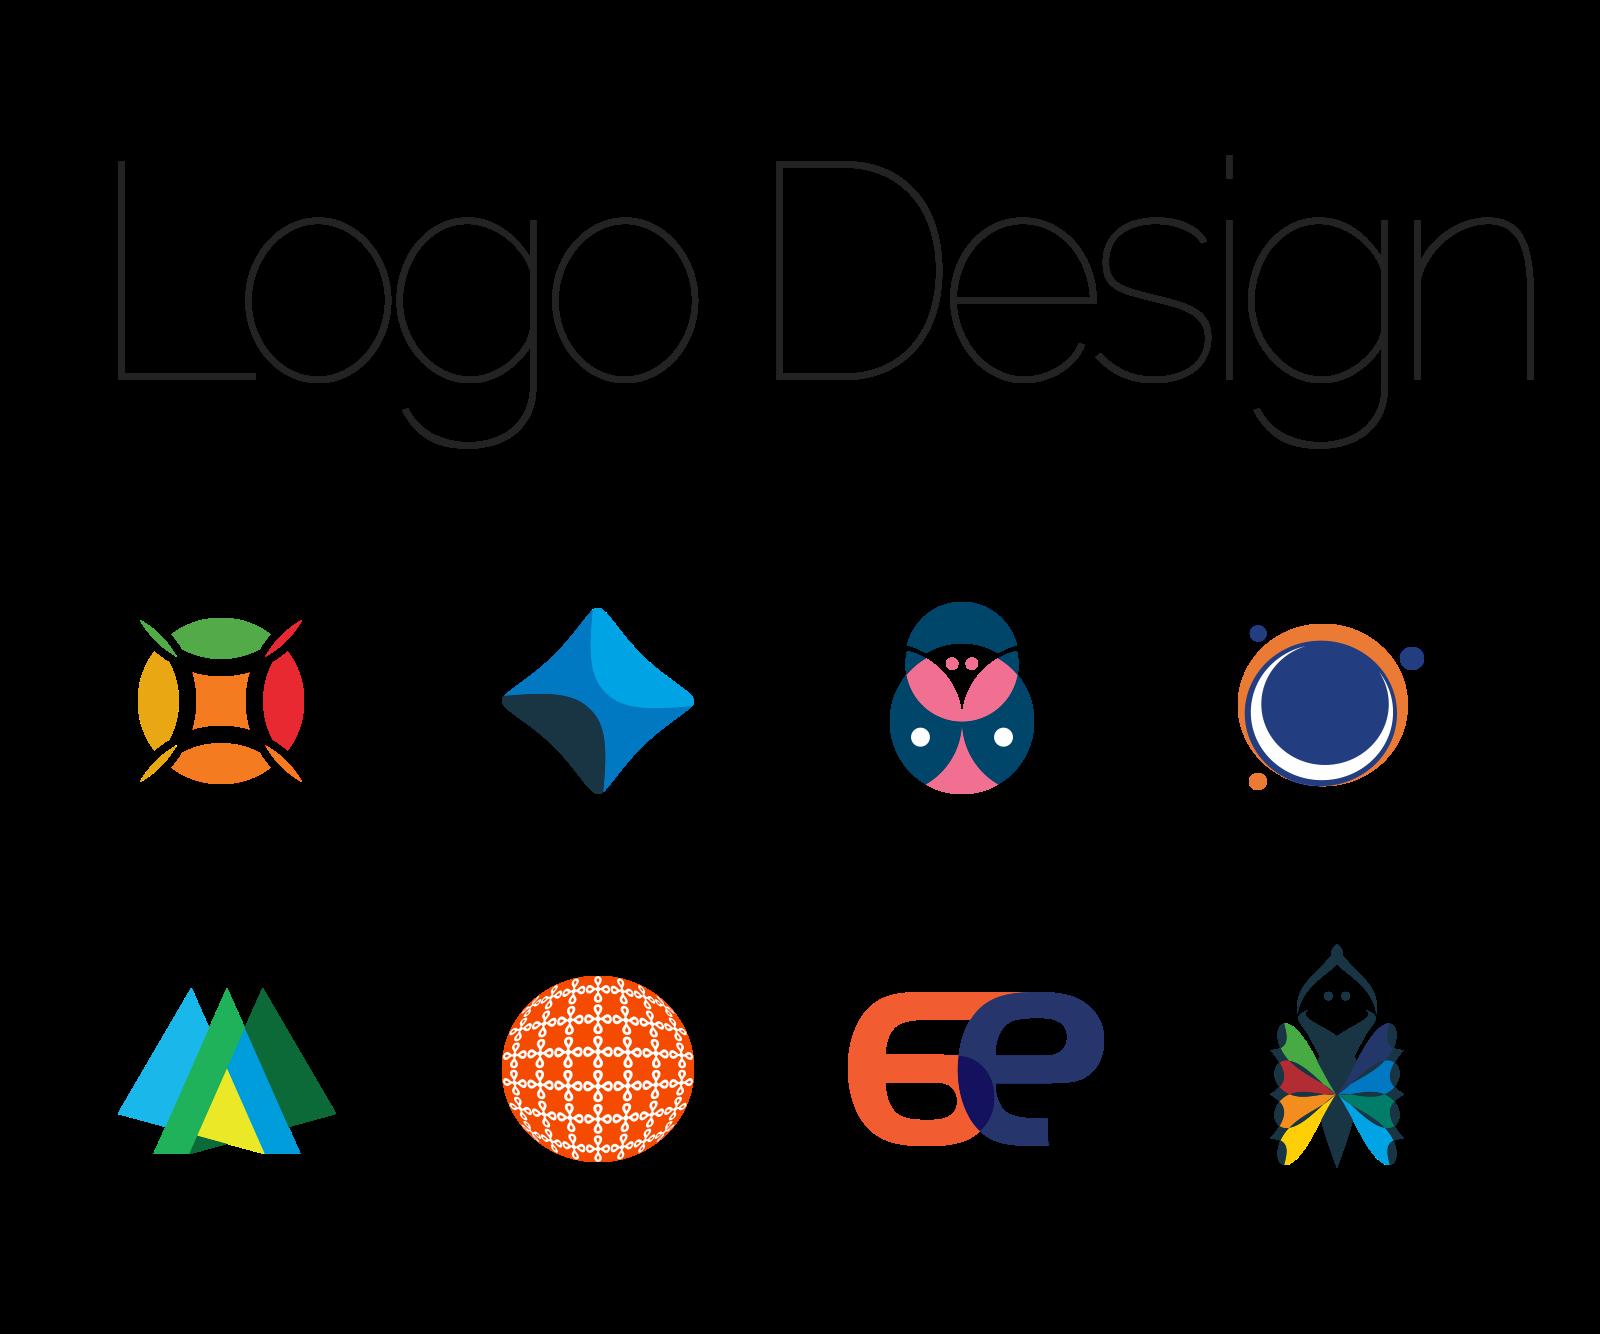 15 Web Design Logo Images - Free Logo Design